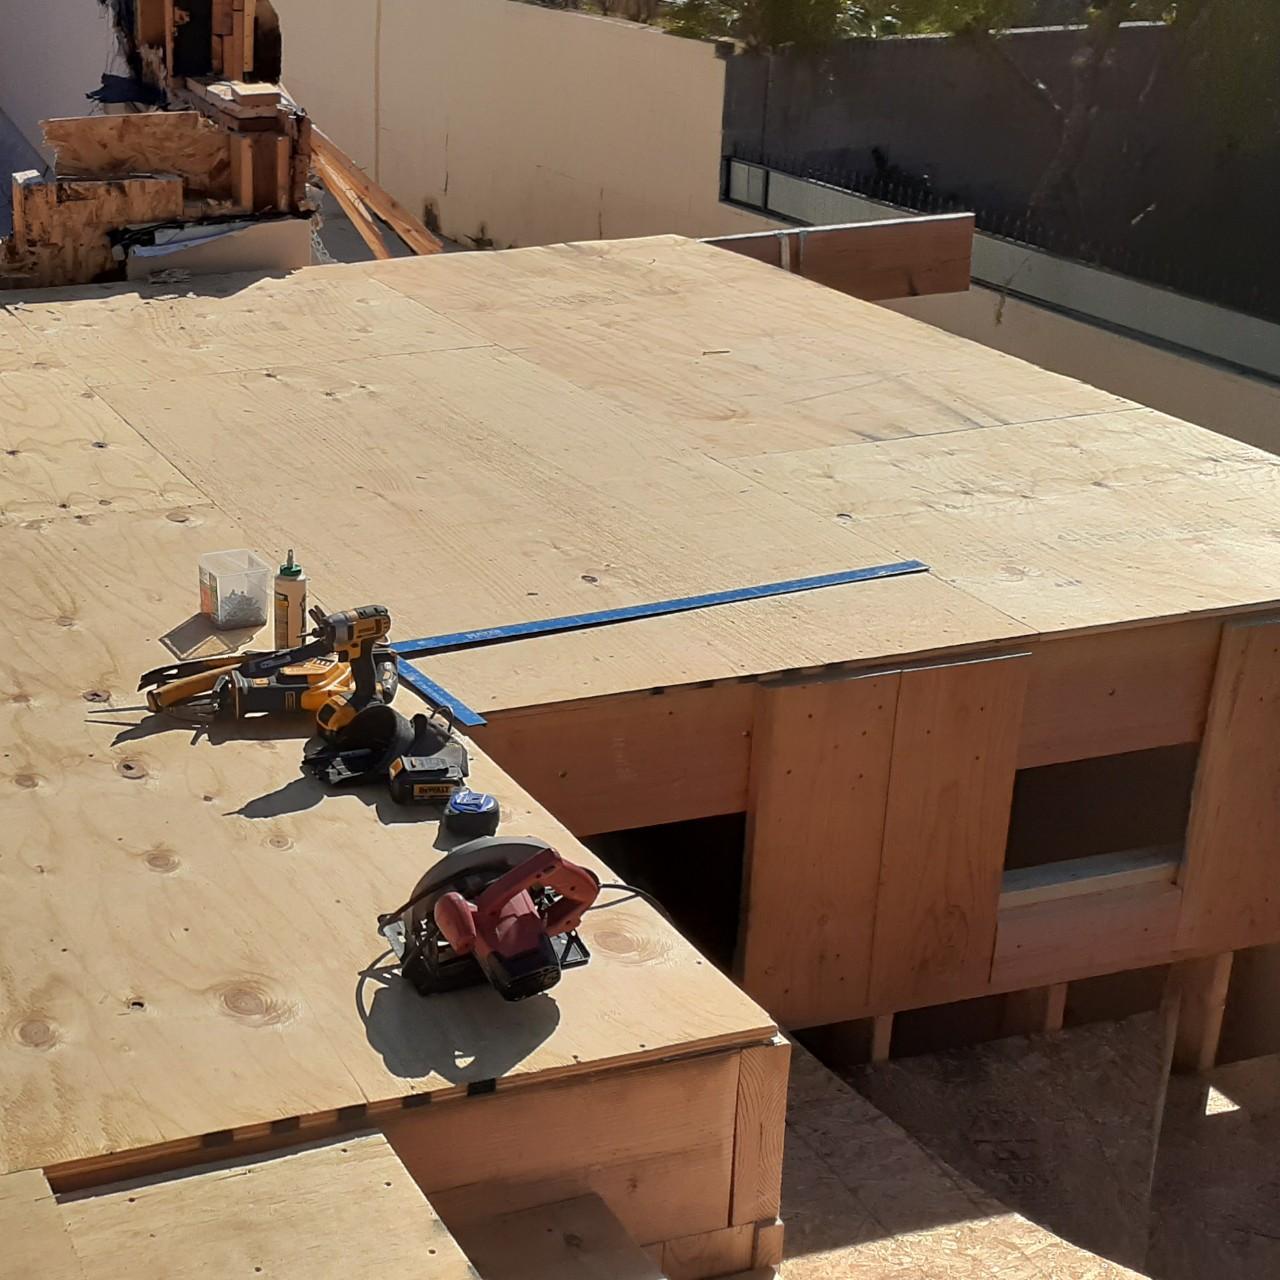 carpentry-wood-framing-second-floor-home-addition--framing-64